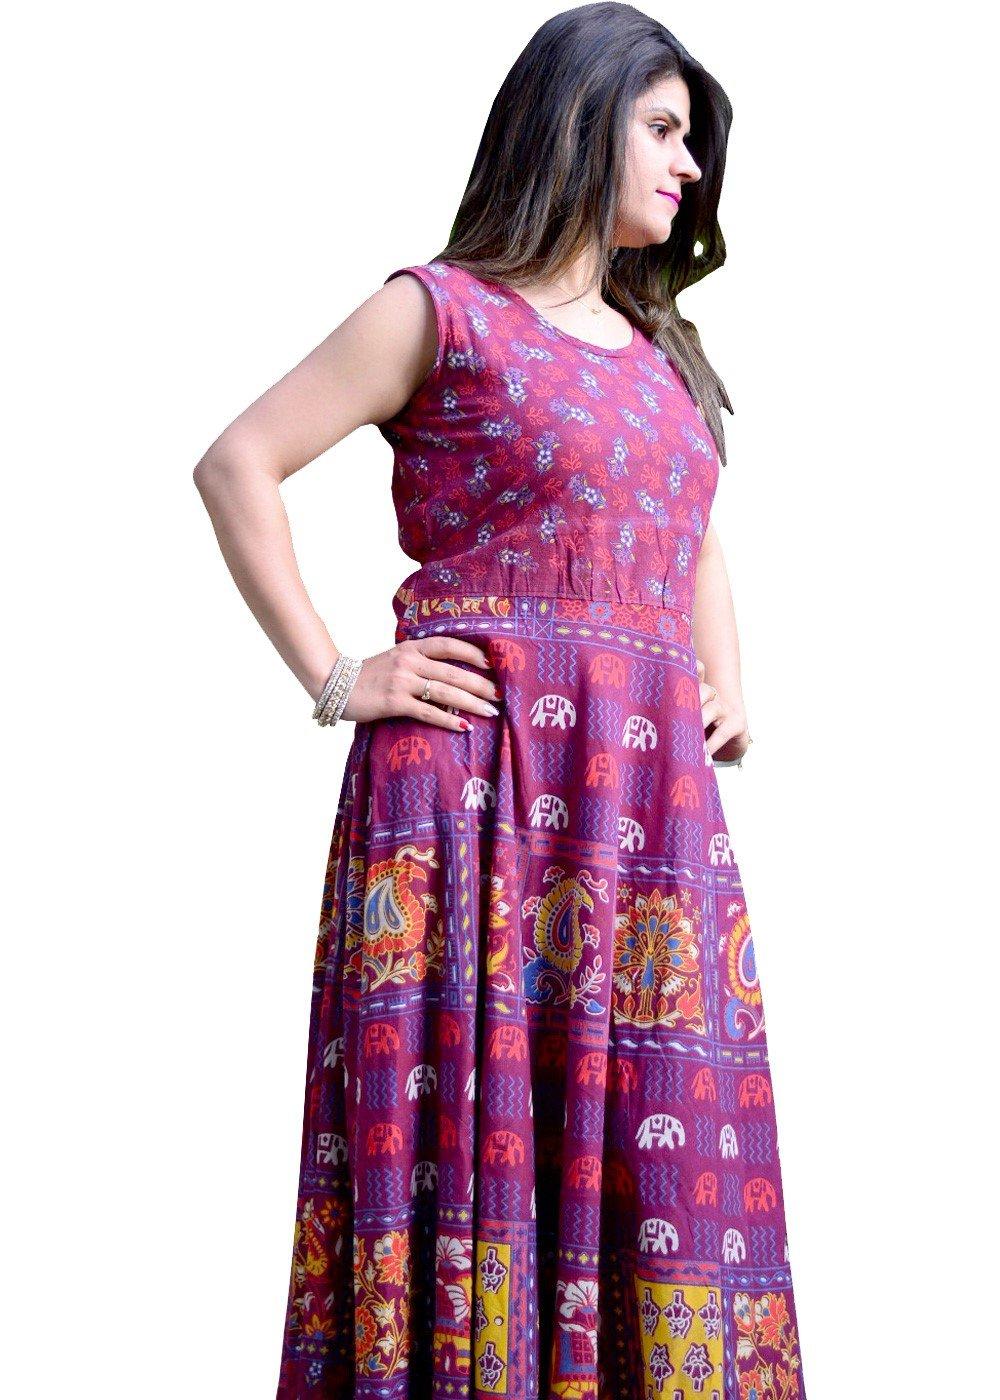 Classic Geometric Print Handmade Maxi Dress